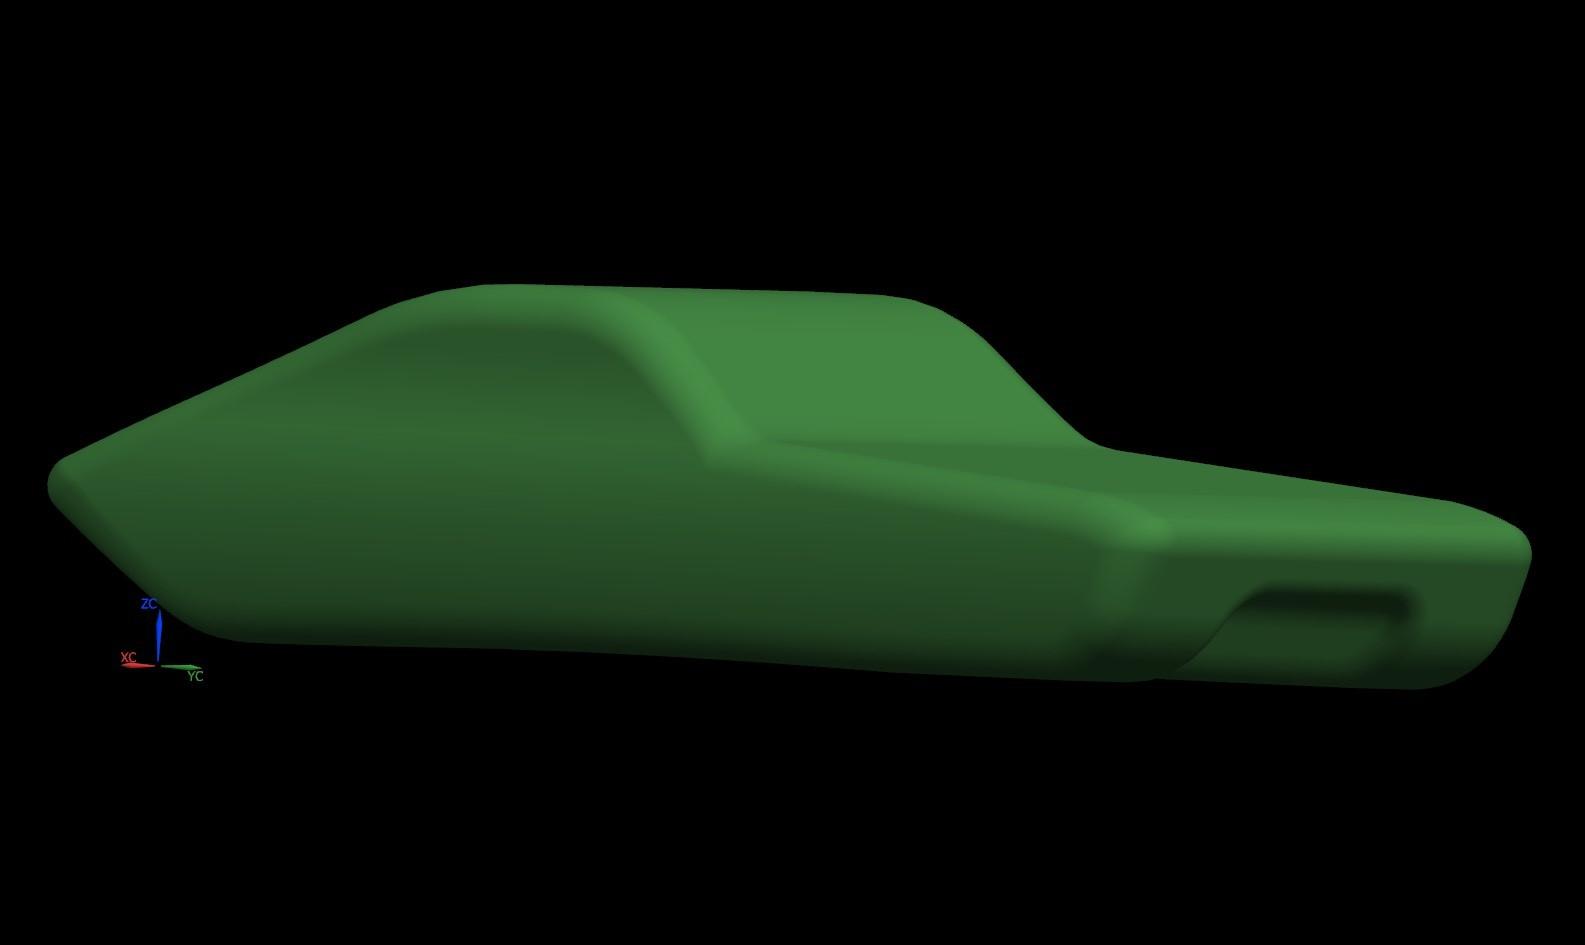 A render of the brand new Aurora design